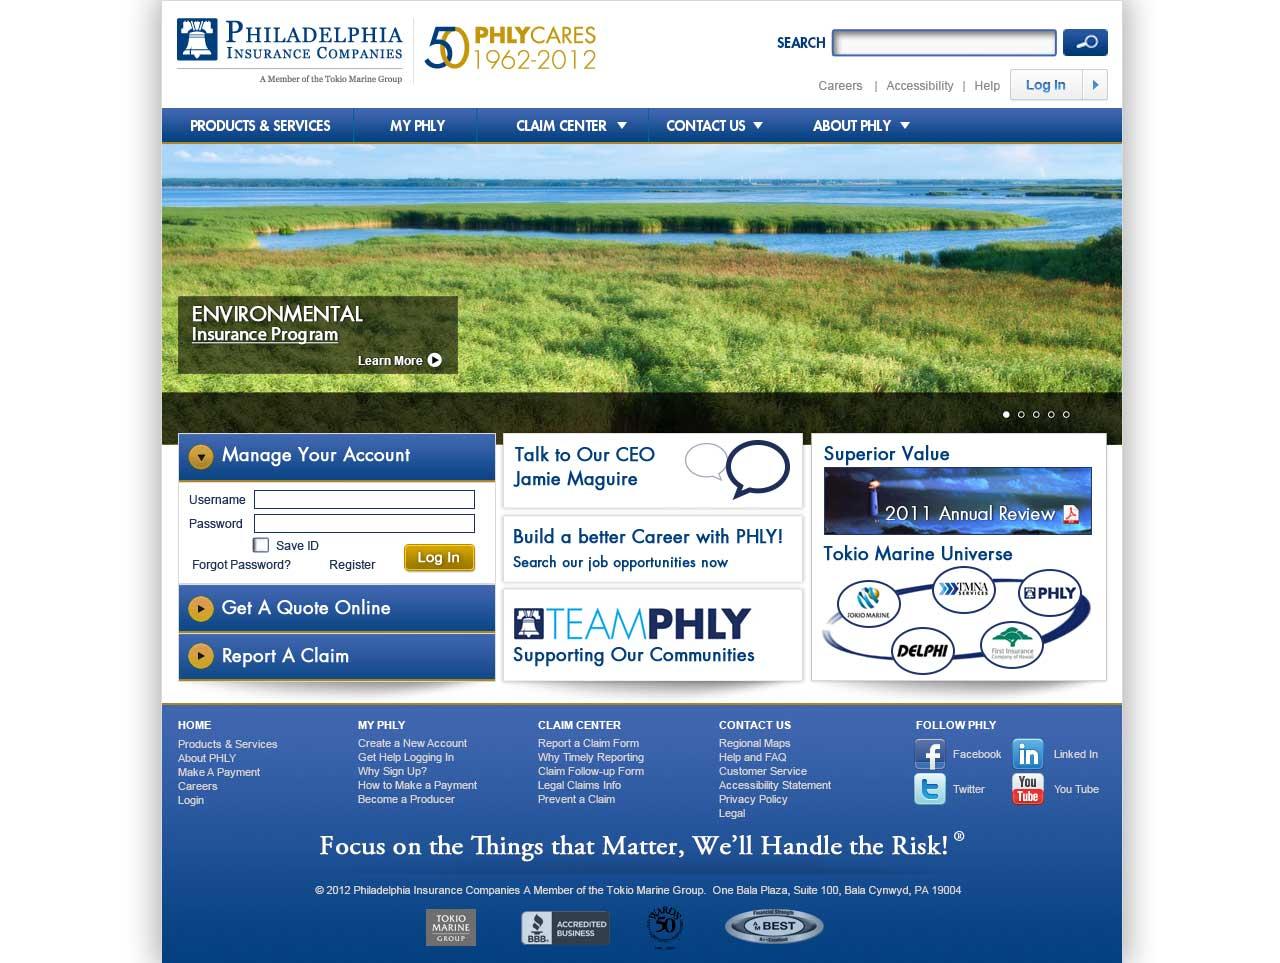 PHLY Home page circa 2012